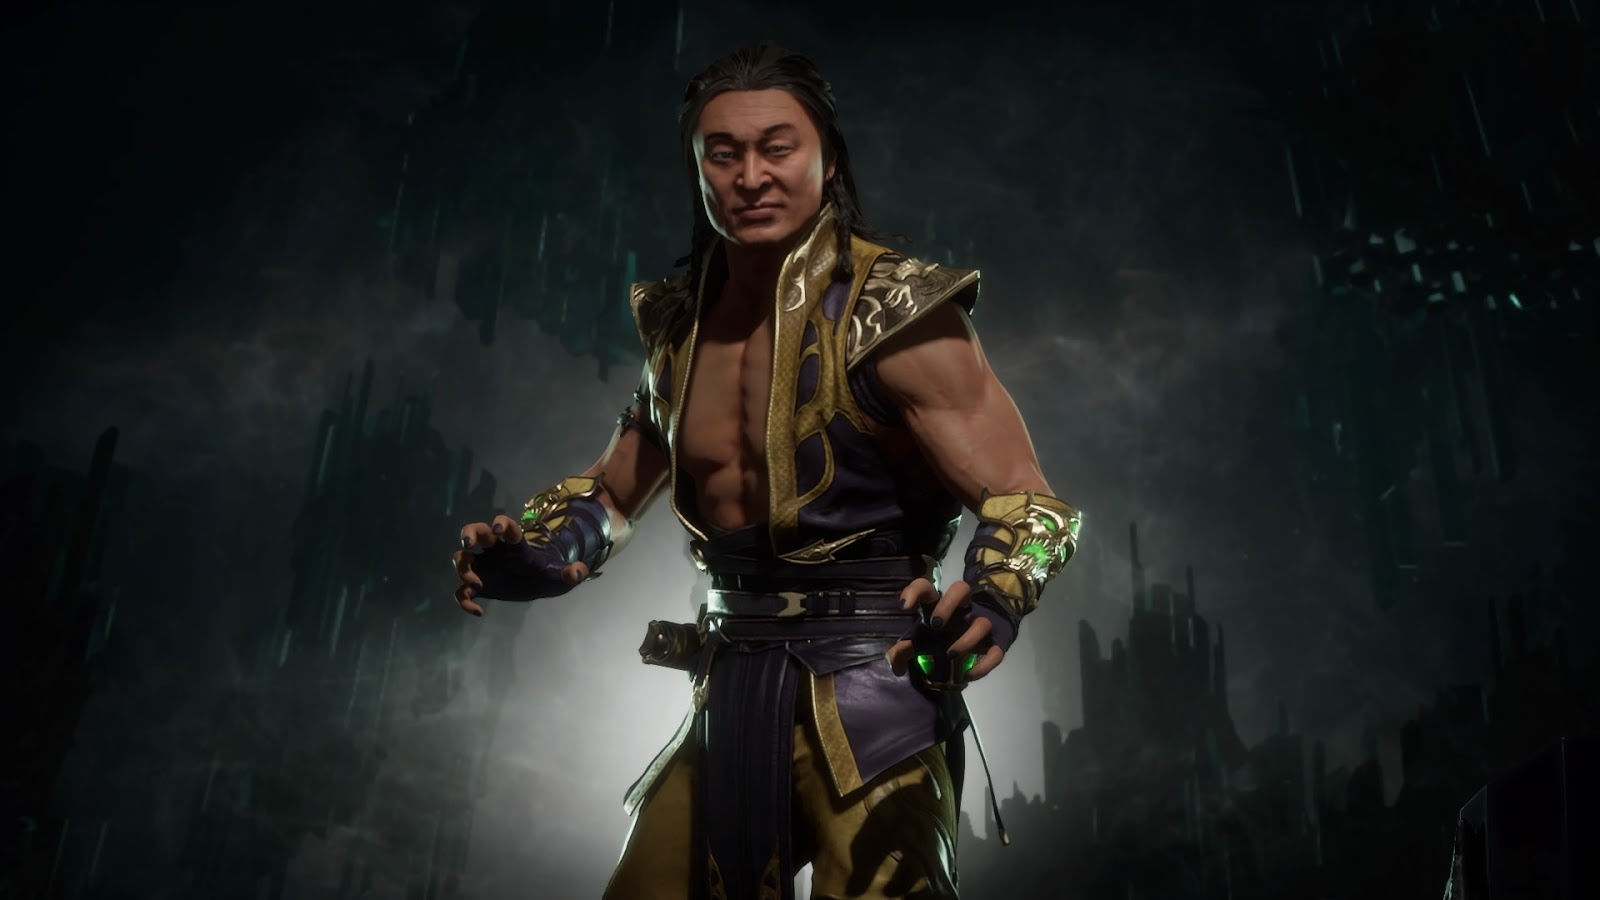 Dr Jengo S World Mortal Kombat 11 Kombat Pack S 1st Dlc